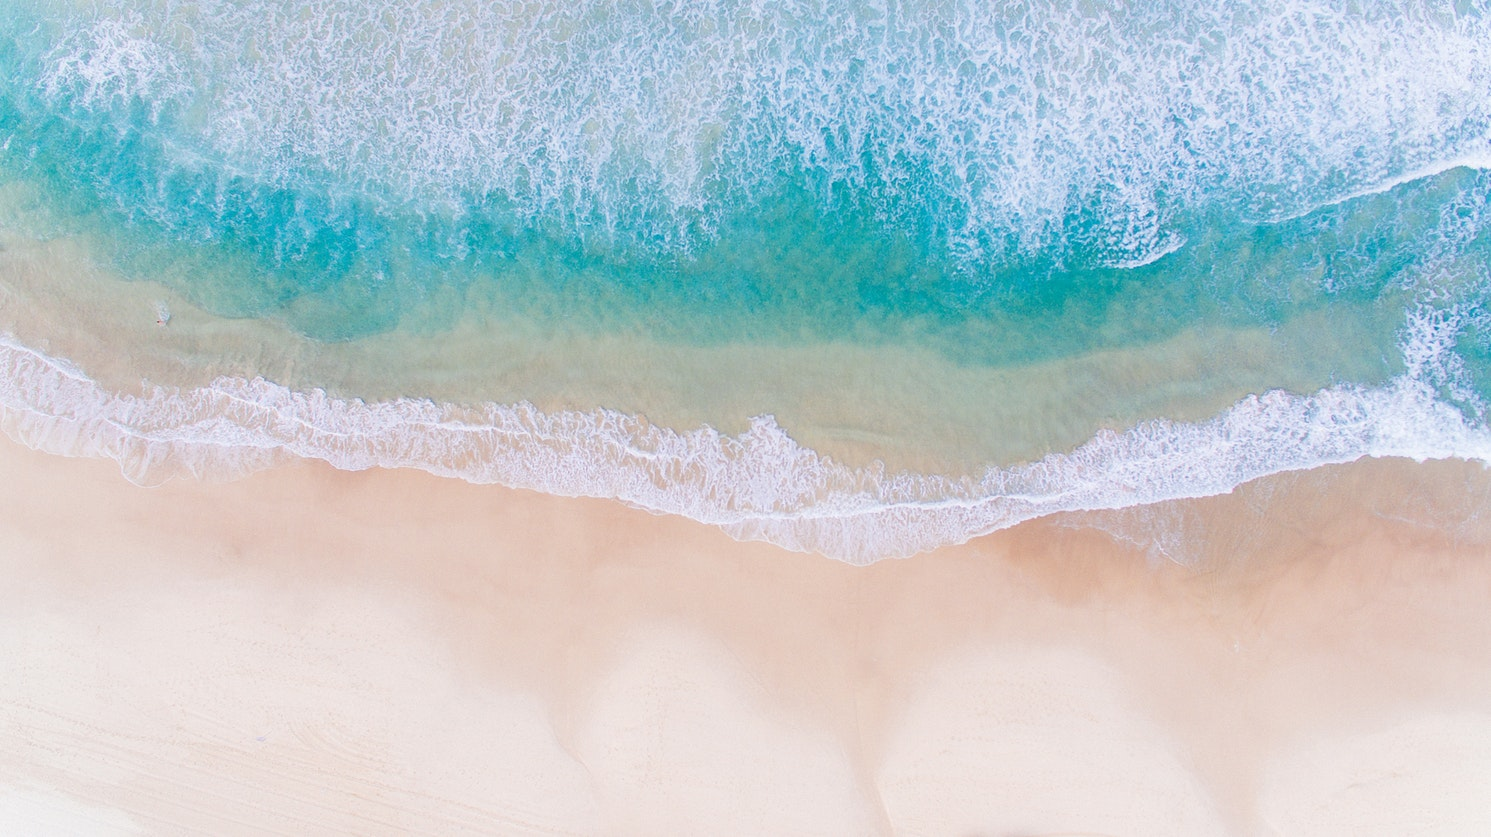 Bondi Beach, Australia - Matthew Kane